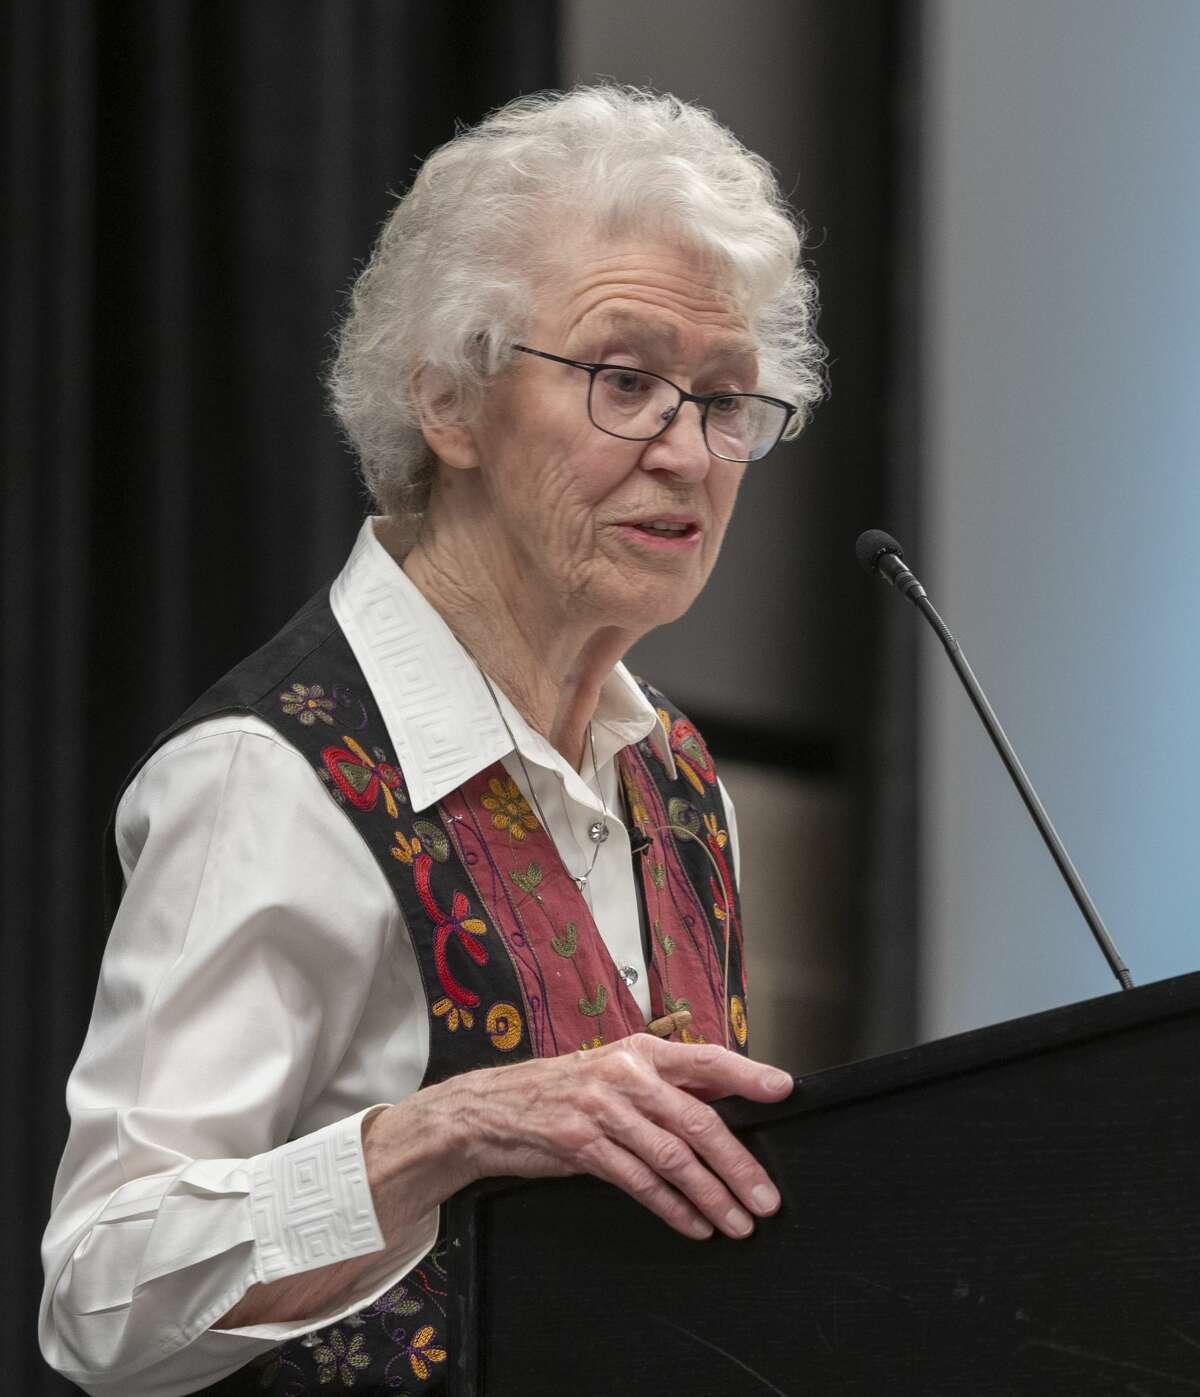 Jill Bownds speaks 02/04/20 morning about her life as as a Christian at the 2020 Permian Basin Prayer Breakfast. Tim Fischer/Reporter-Telegram